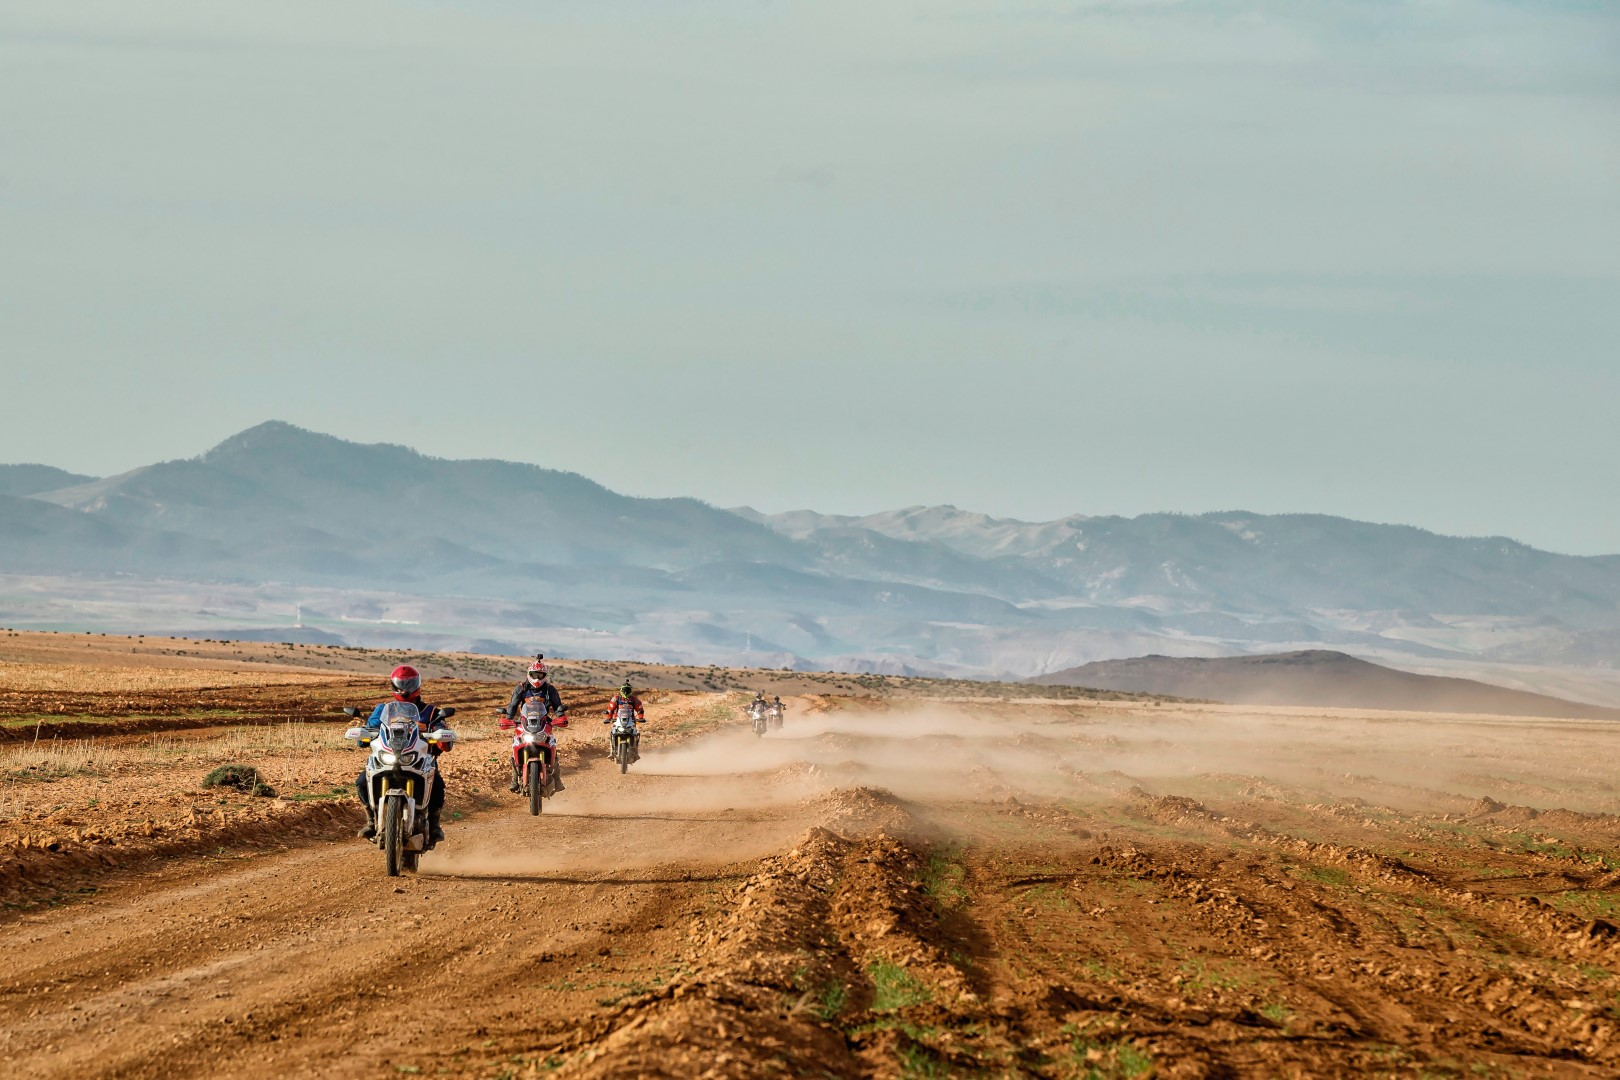 Honda Africa Twin Morocco Epic Tour, así fue la aventura